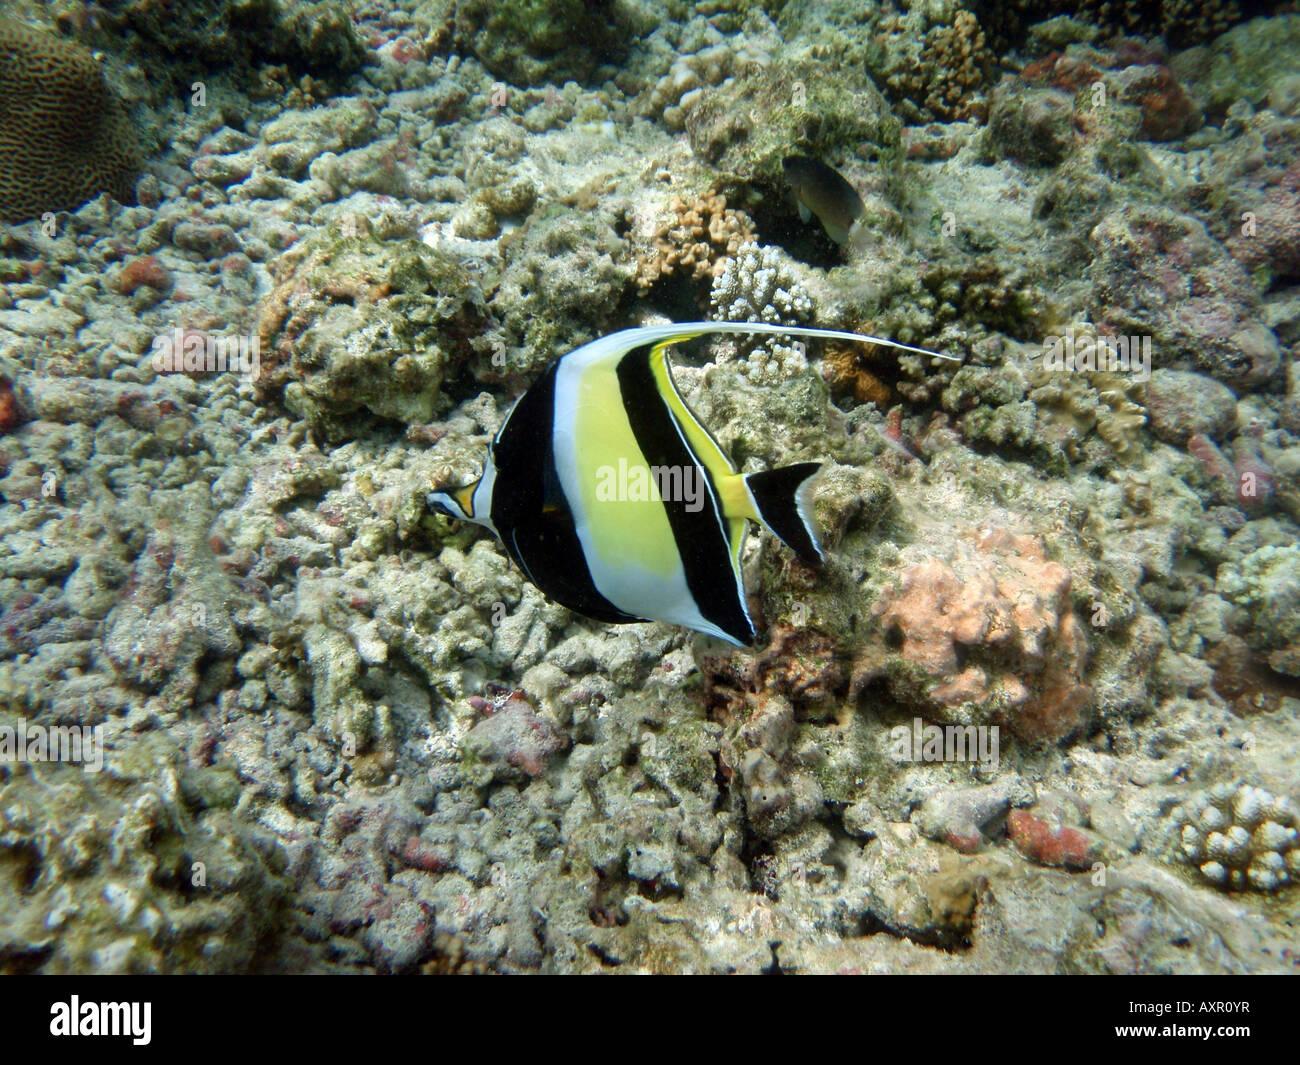 Moorish Idol [Bandos Island Reef, Kaafu Atoll, Maldives, Asia]                                                  Stock Photo